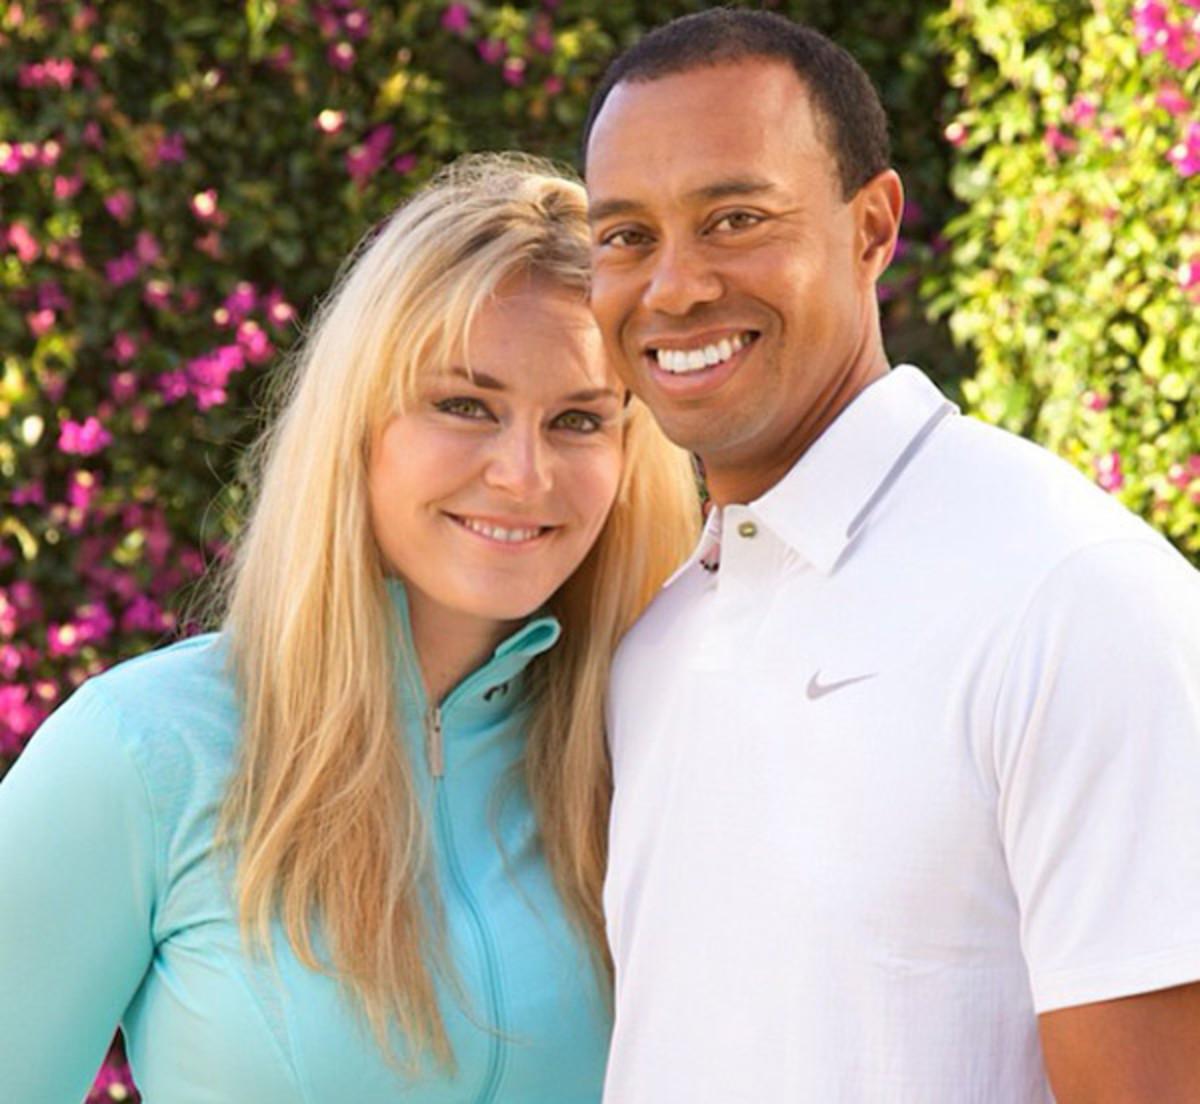 Lindsey Vonn and Tiger Woods :: @lindseyvonn